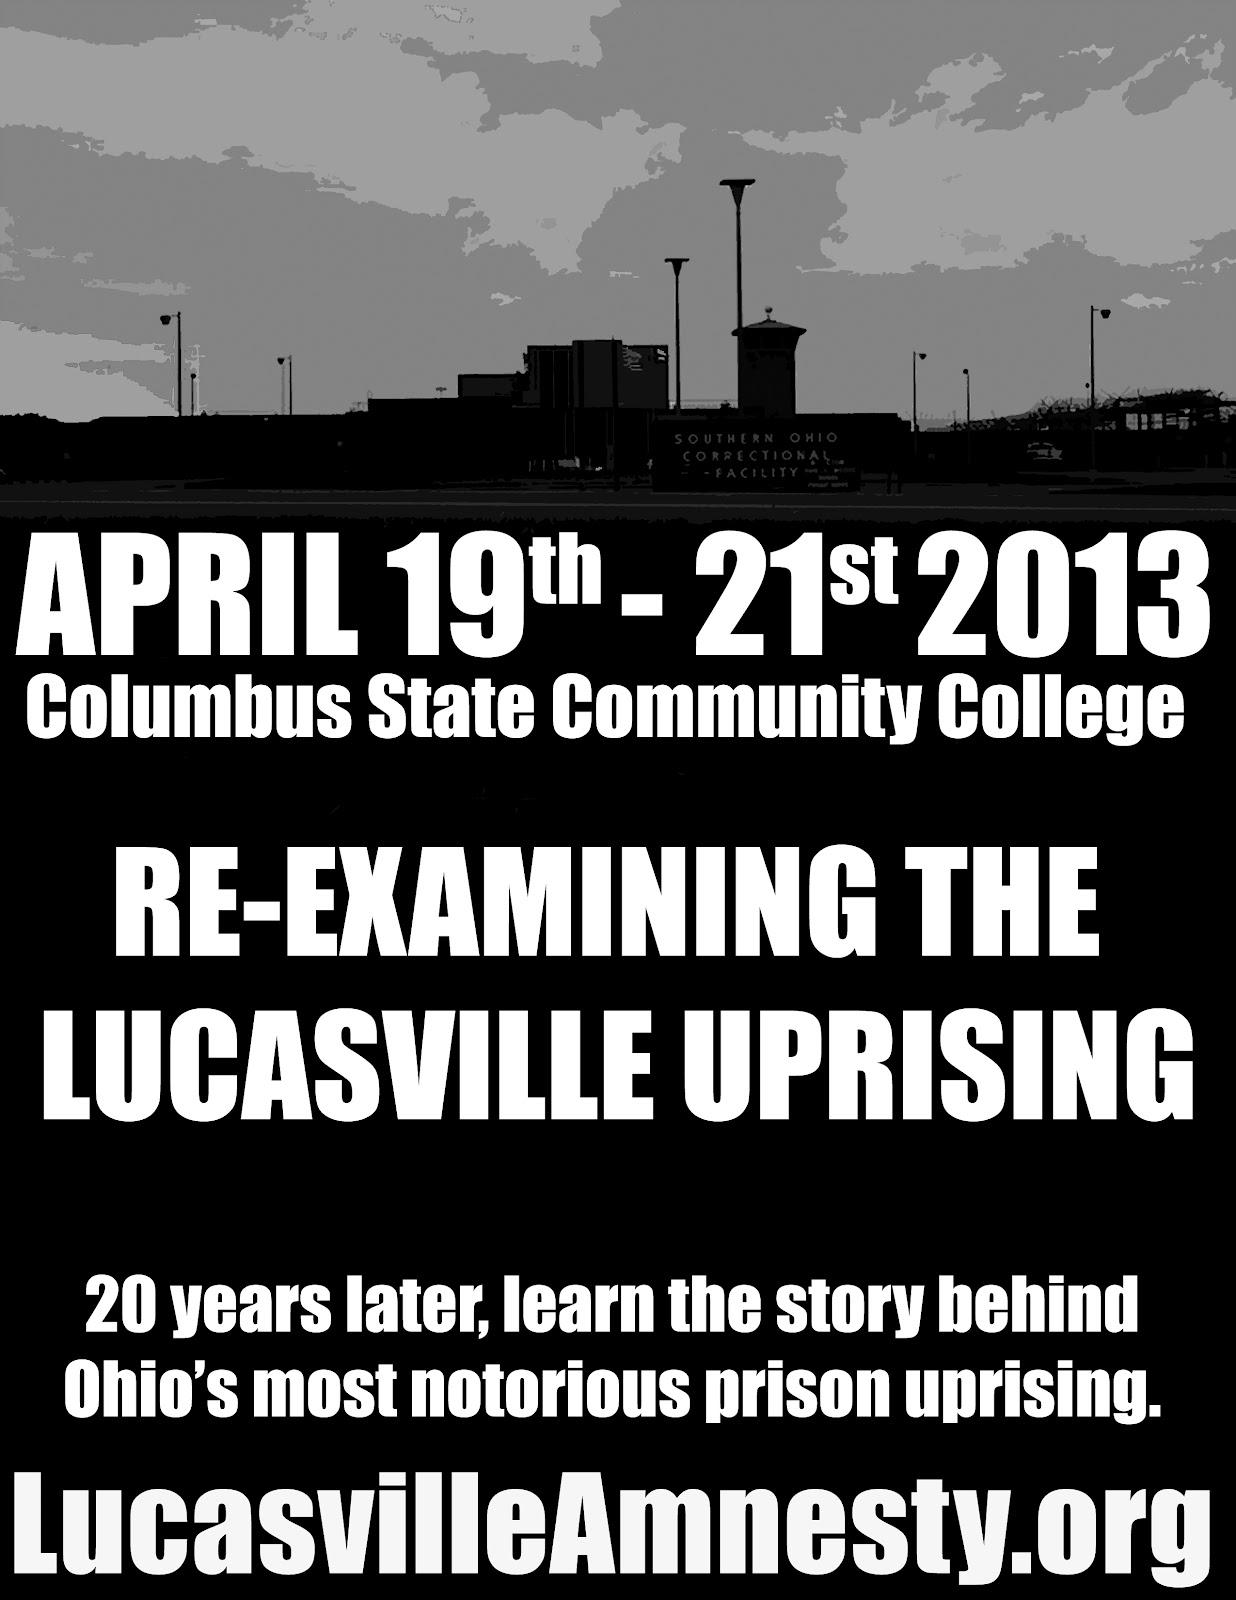 Lucasville Amnesty: June 2012